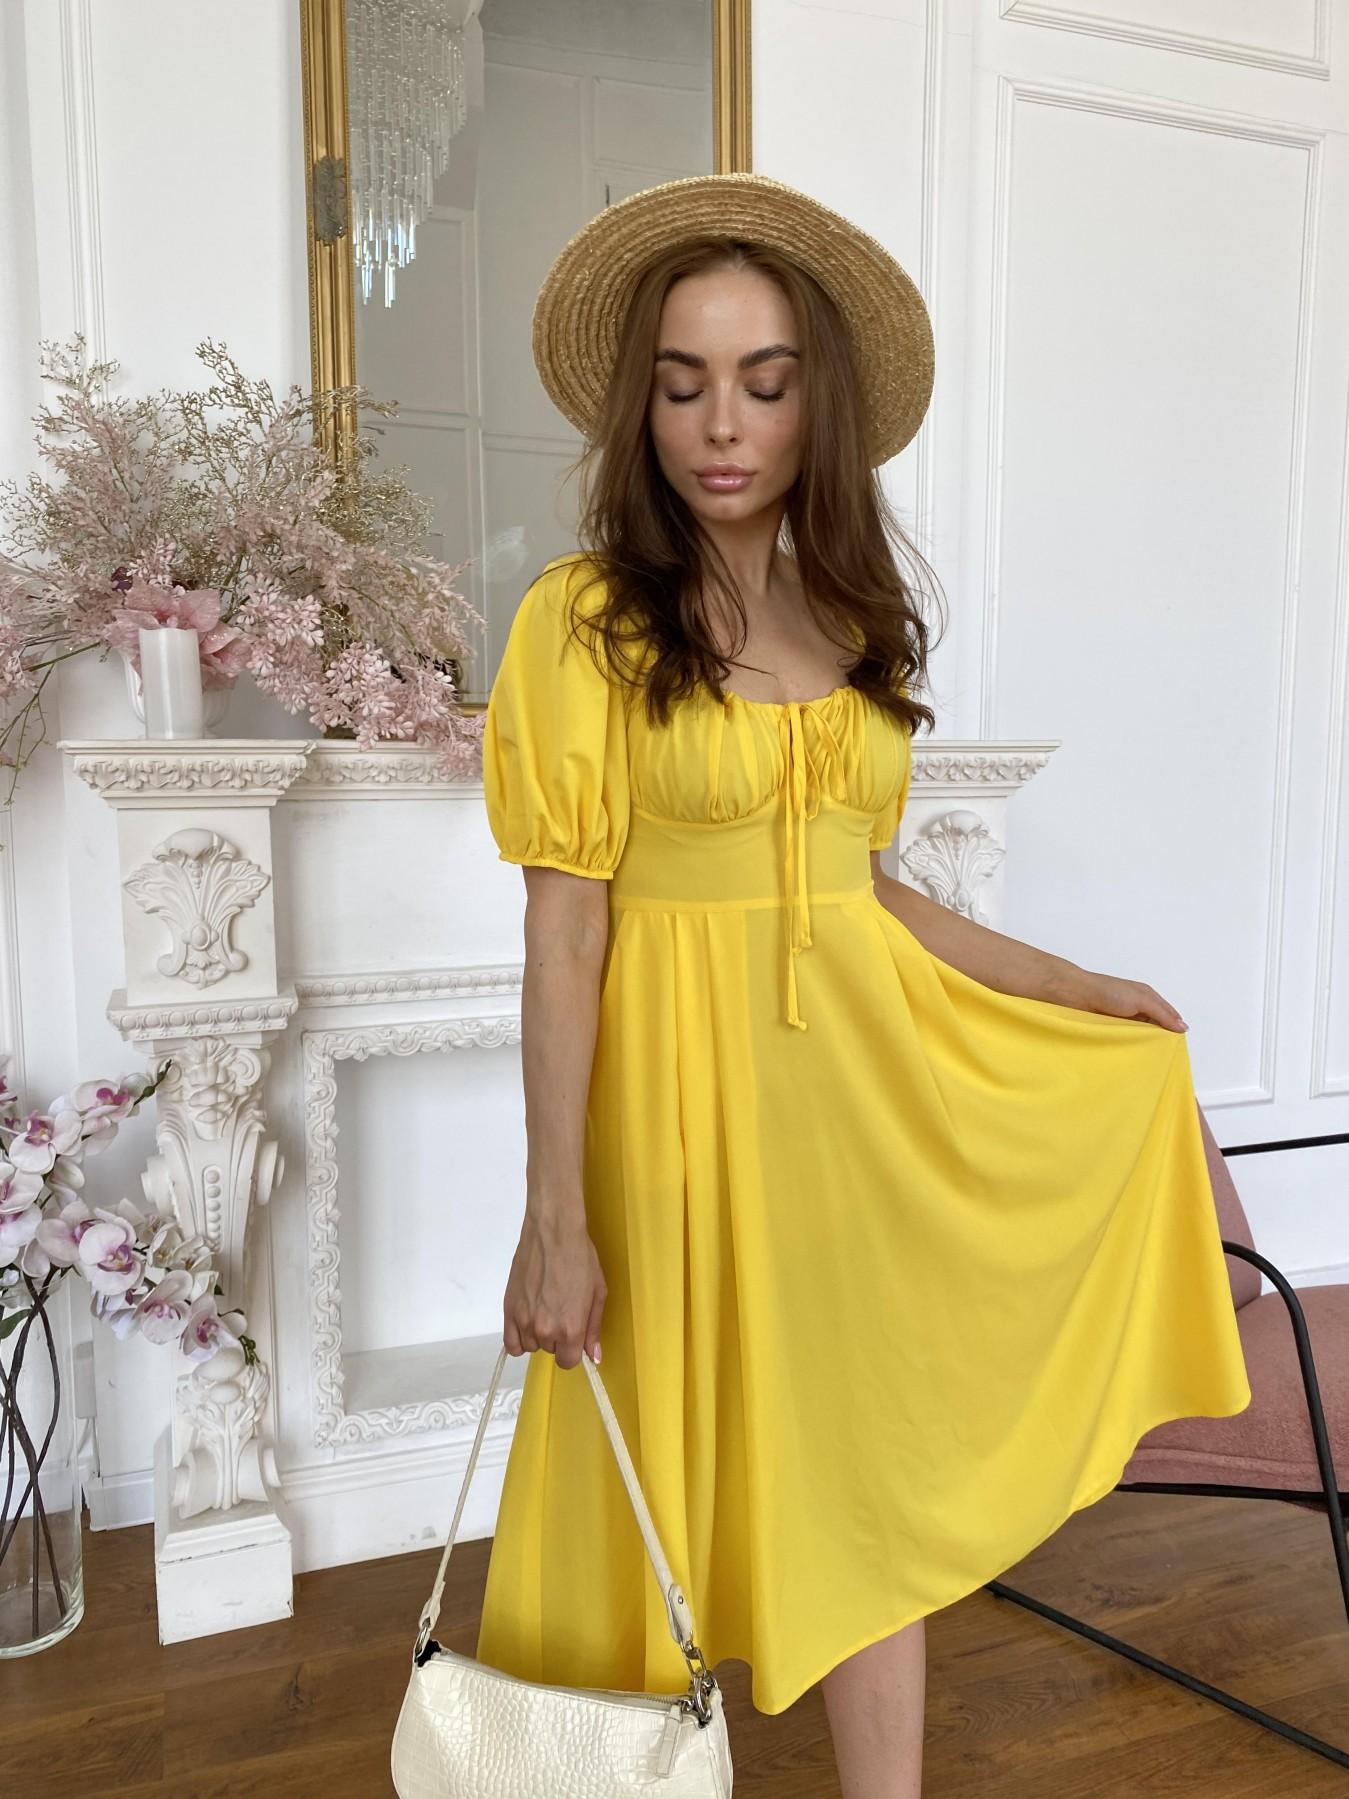 Кисес Миди платье из шифона креп 11443 АРТ. 48205 Цвет: Желтый 14 - фото 4, интернет магазин tm-modus.ru